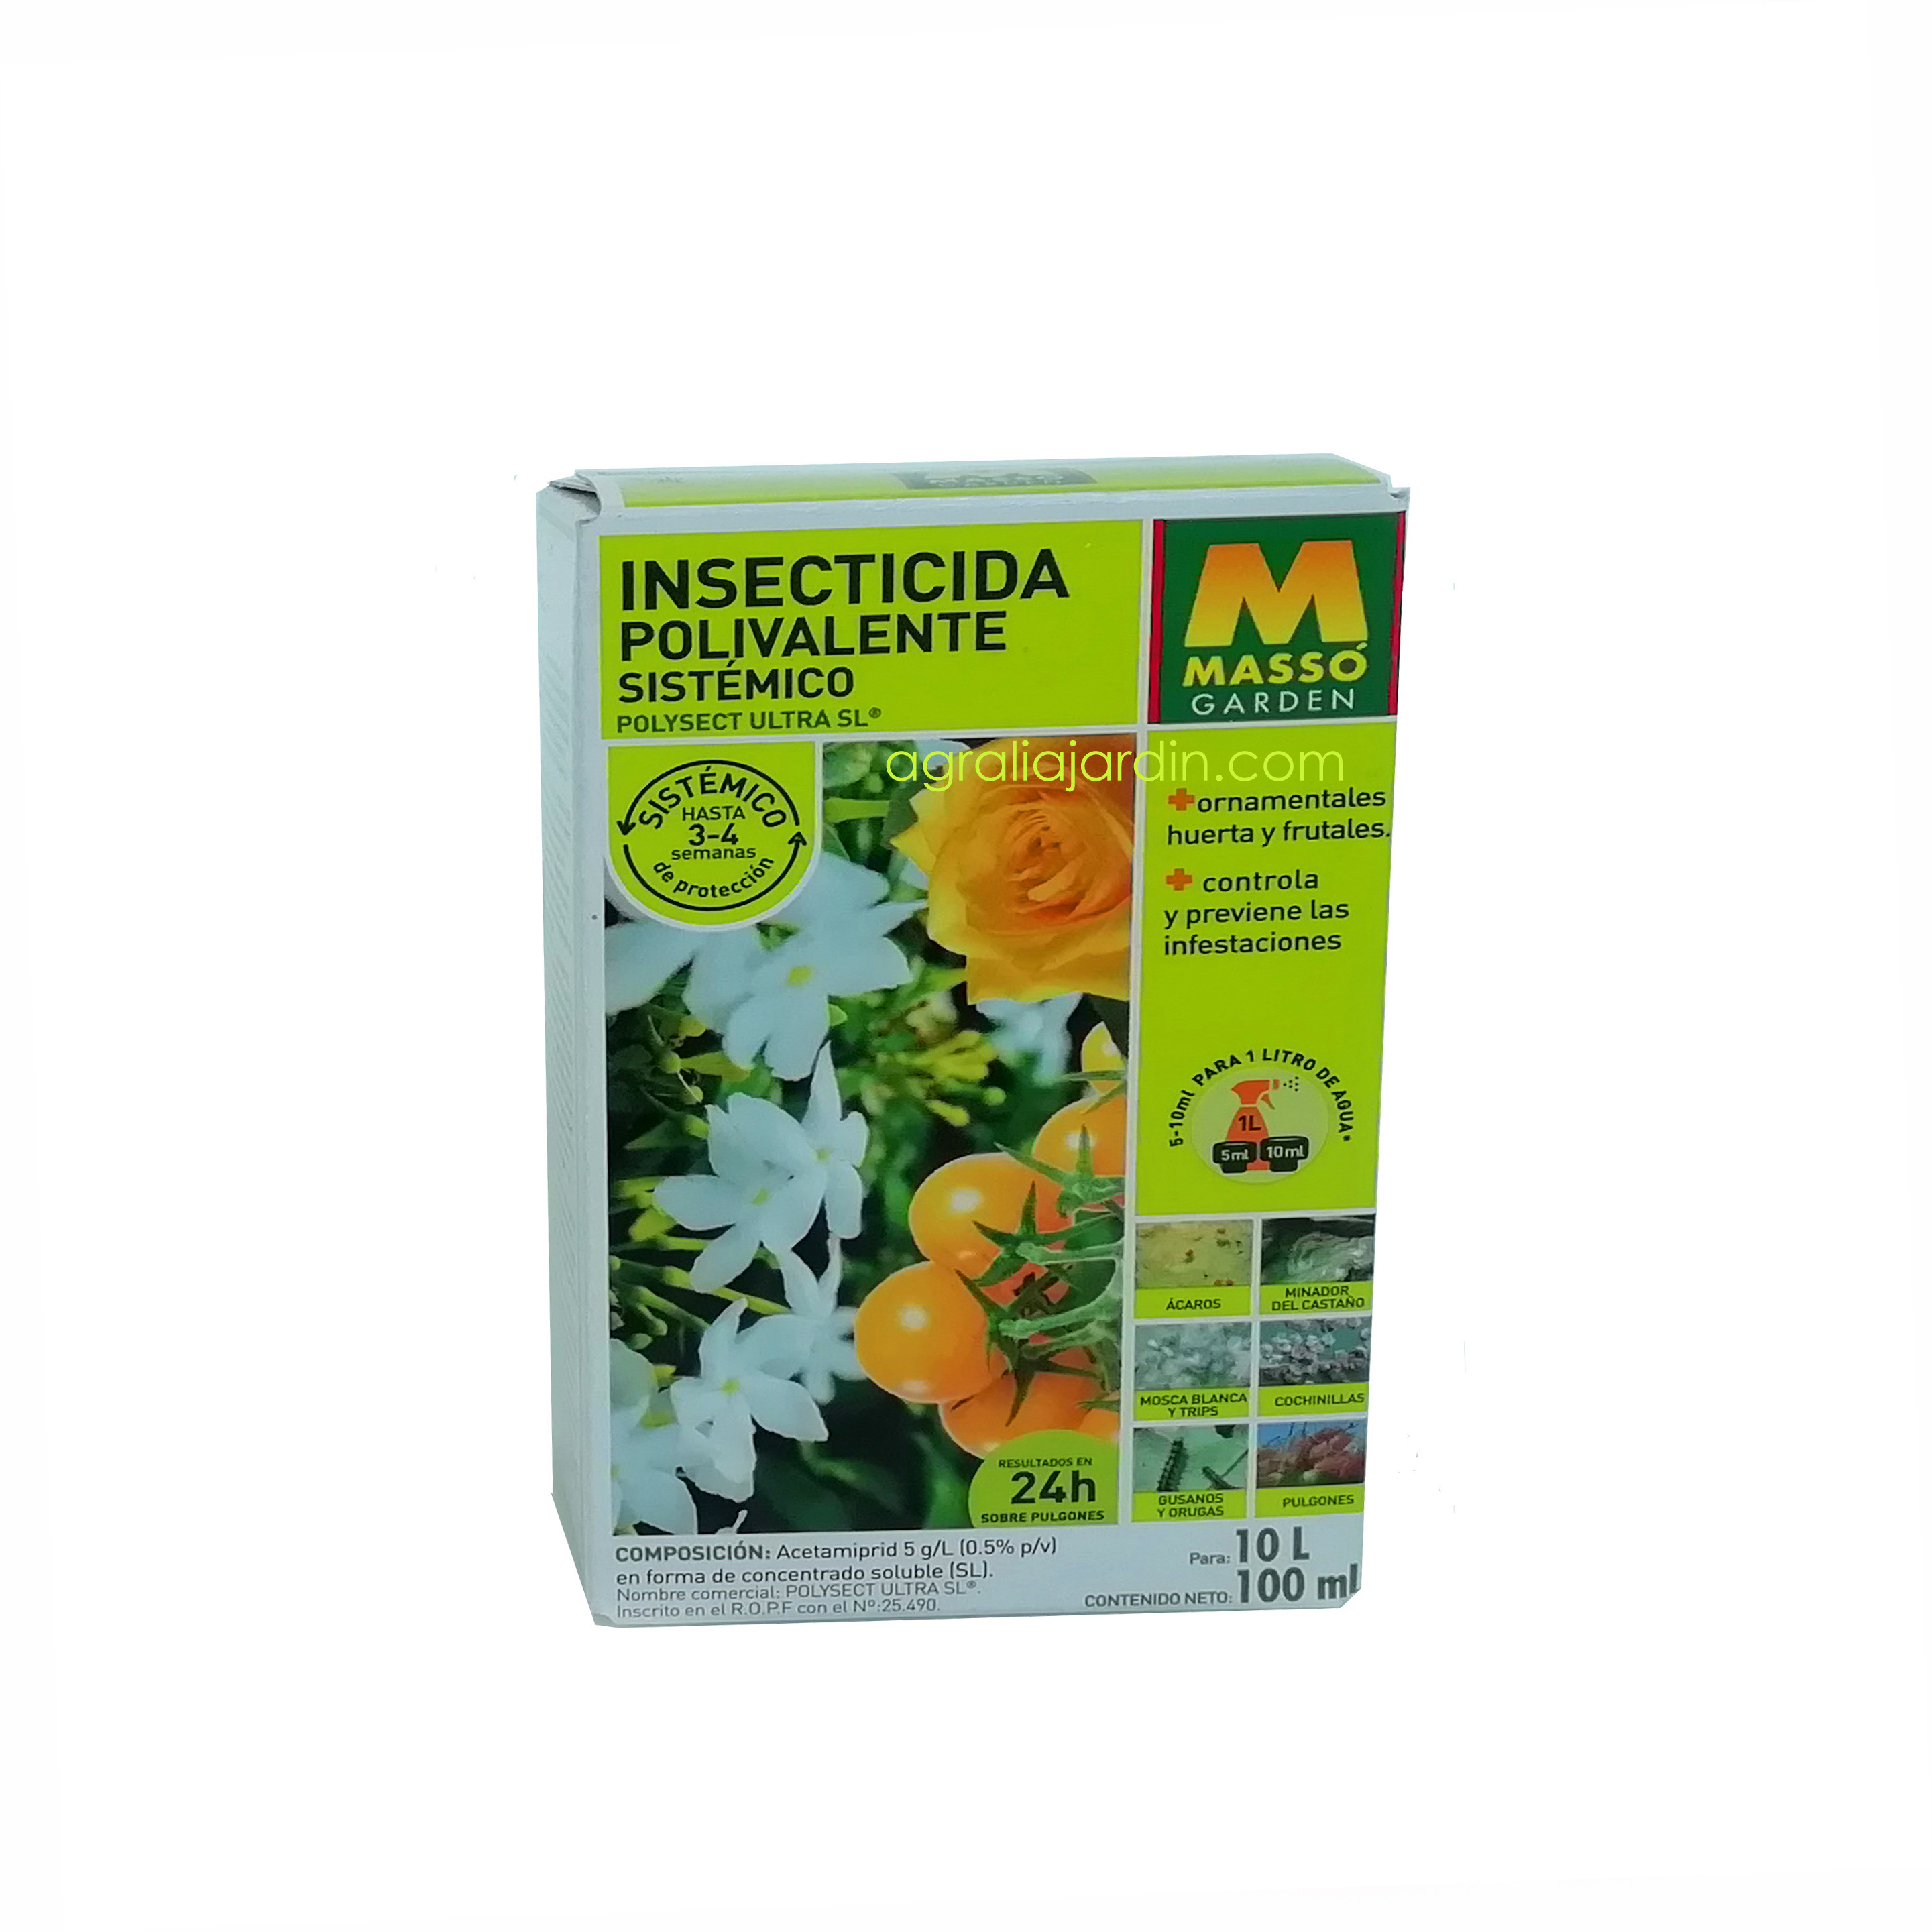 insecticida polivalente sistemico masso garden agraliajardin.com